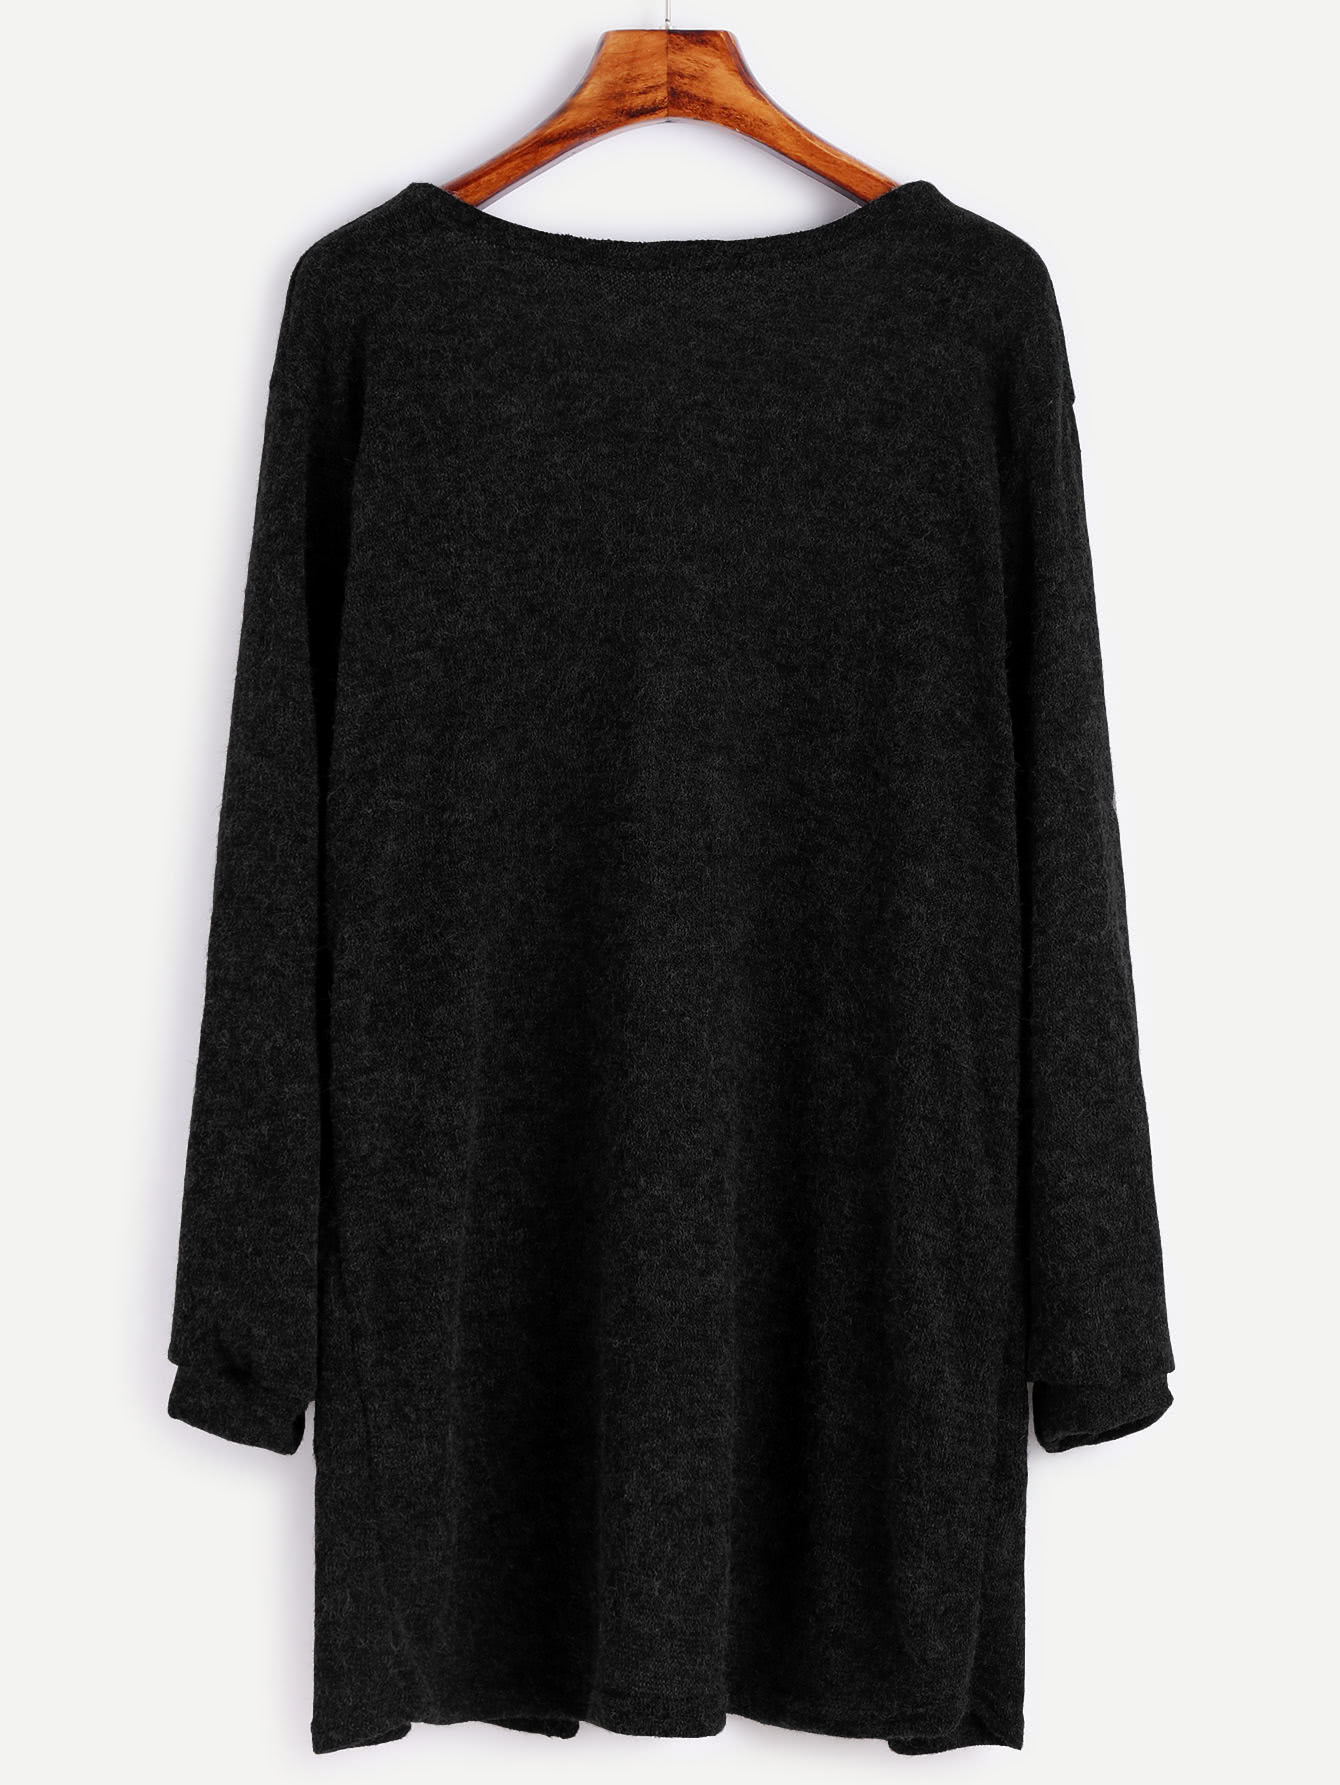 sweater161019101_2